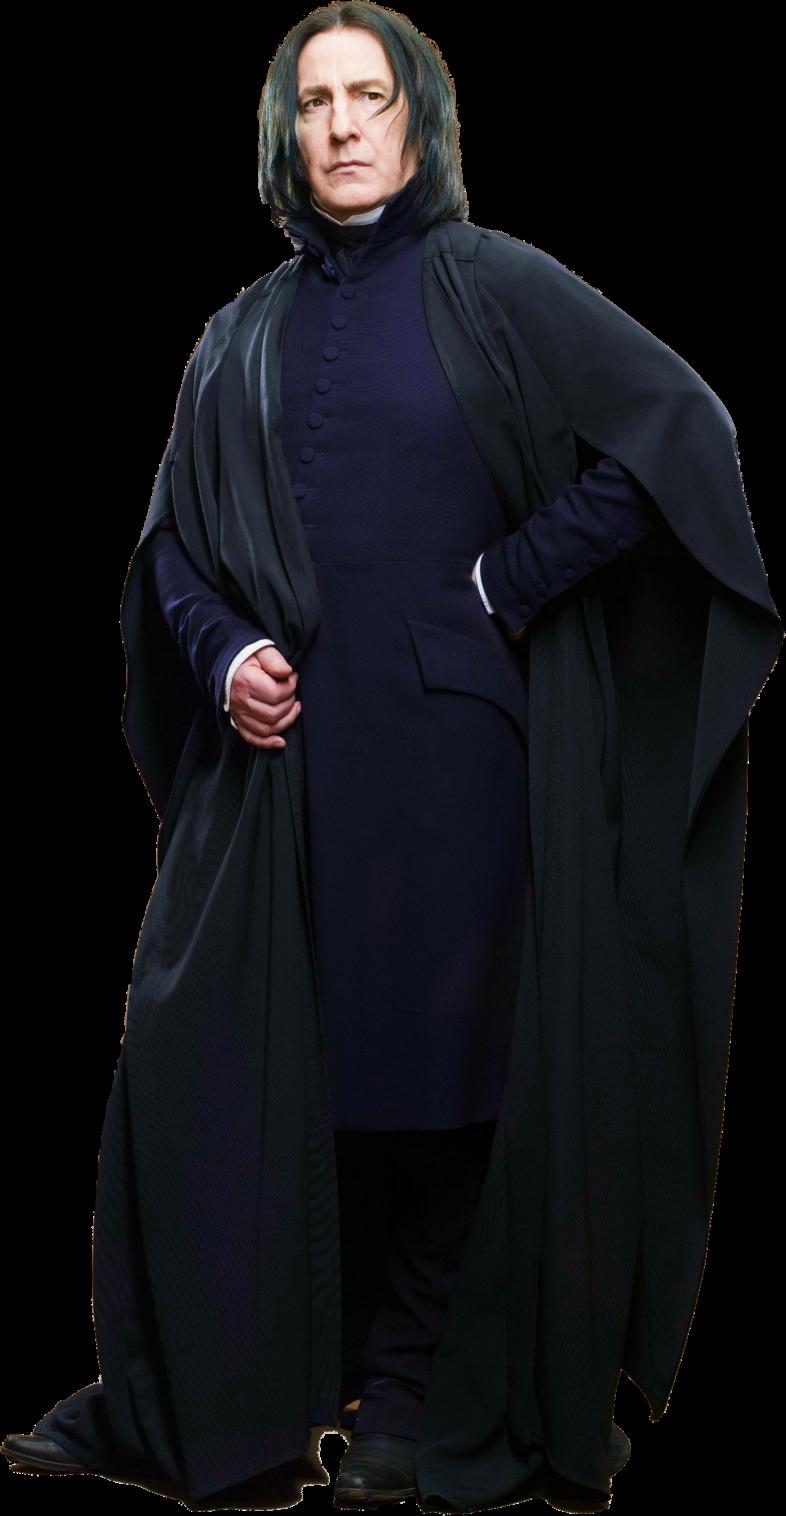 Severus Snape PNG - 5012